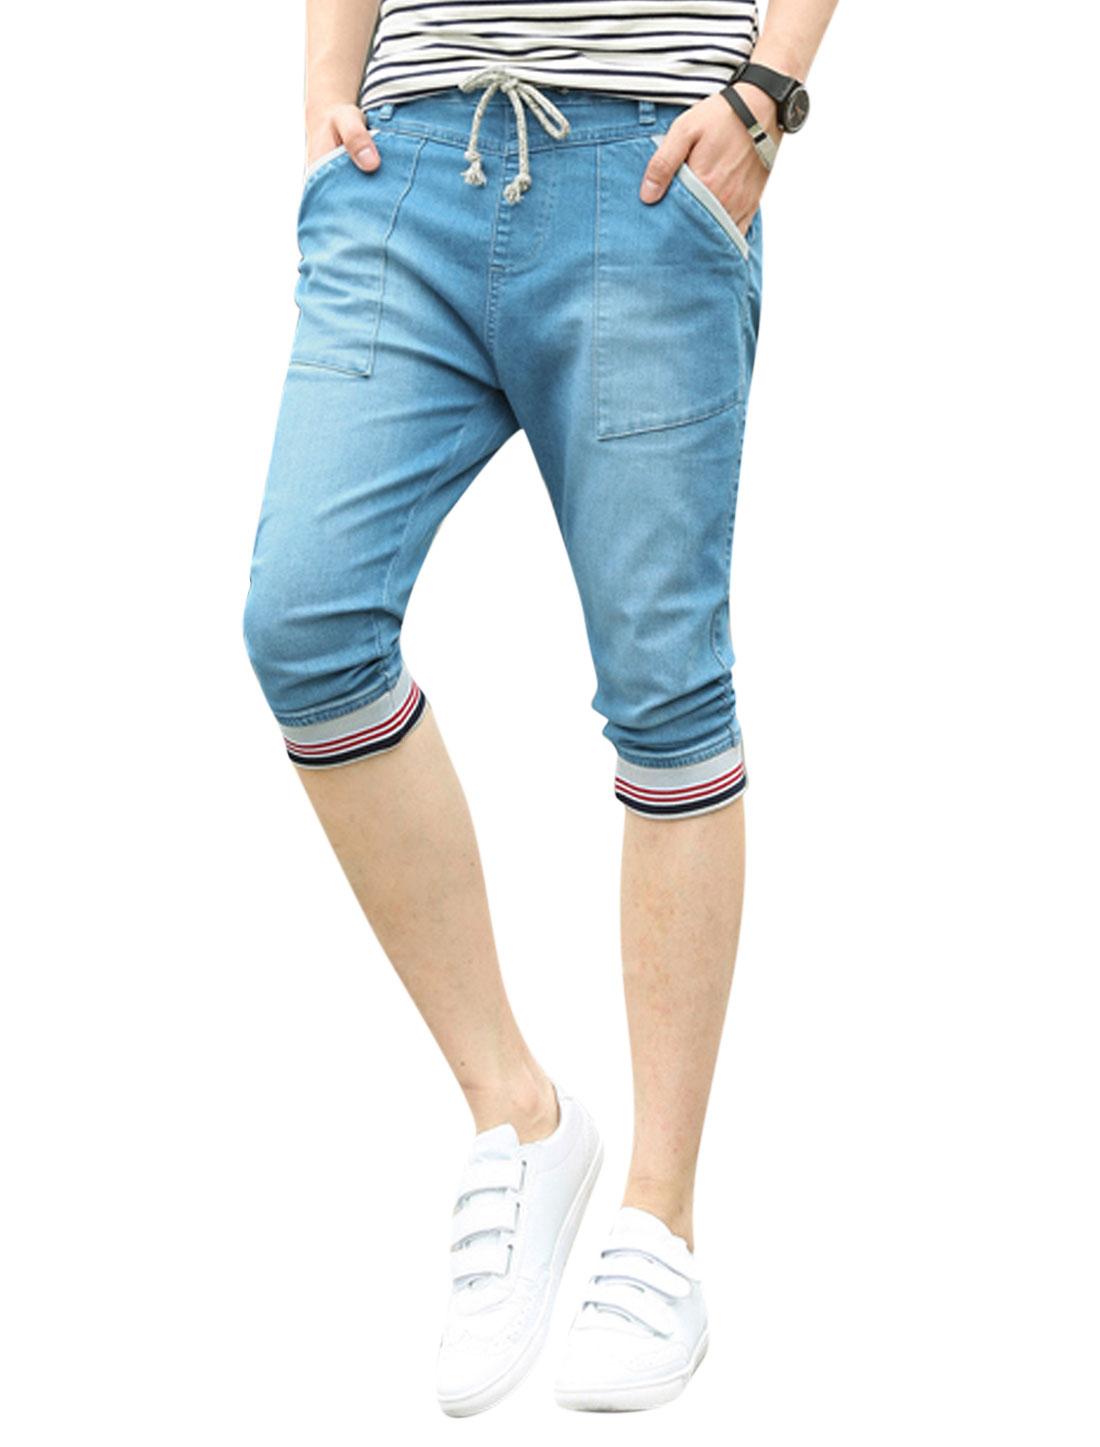 Man Elastic Waist Stripes Trim Drawstring Capri Jeans Blue W32